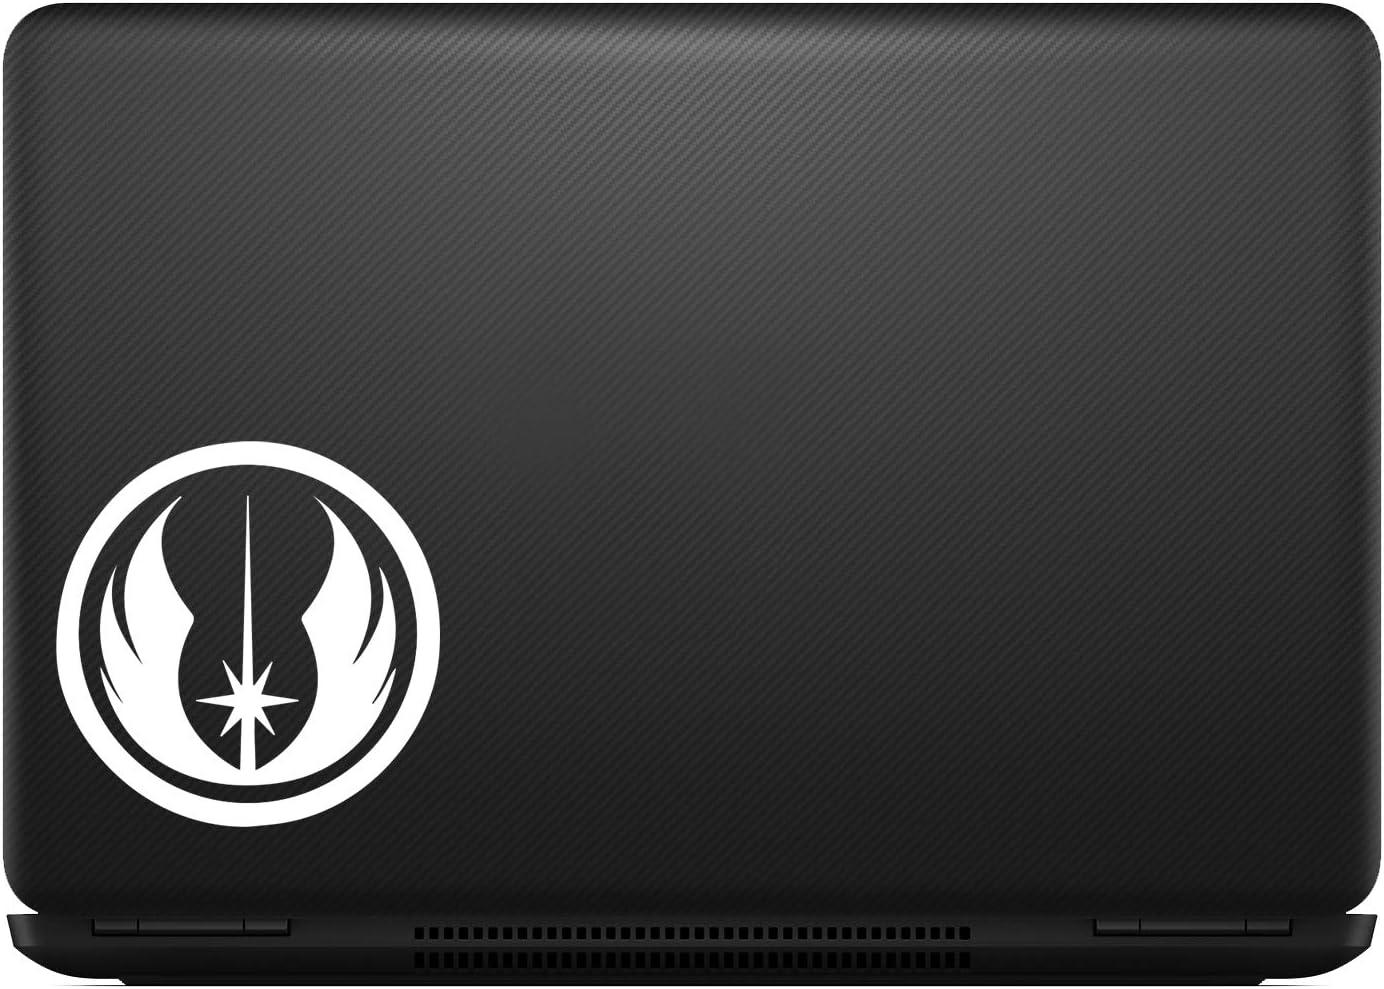 White Jedi Order Sticker Decal Notebook Car Laptop 5 Bargain Max Decals